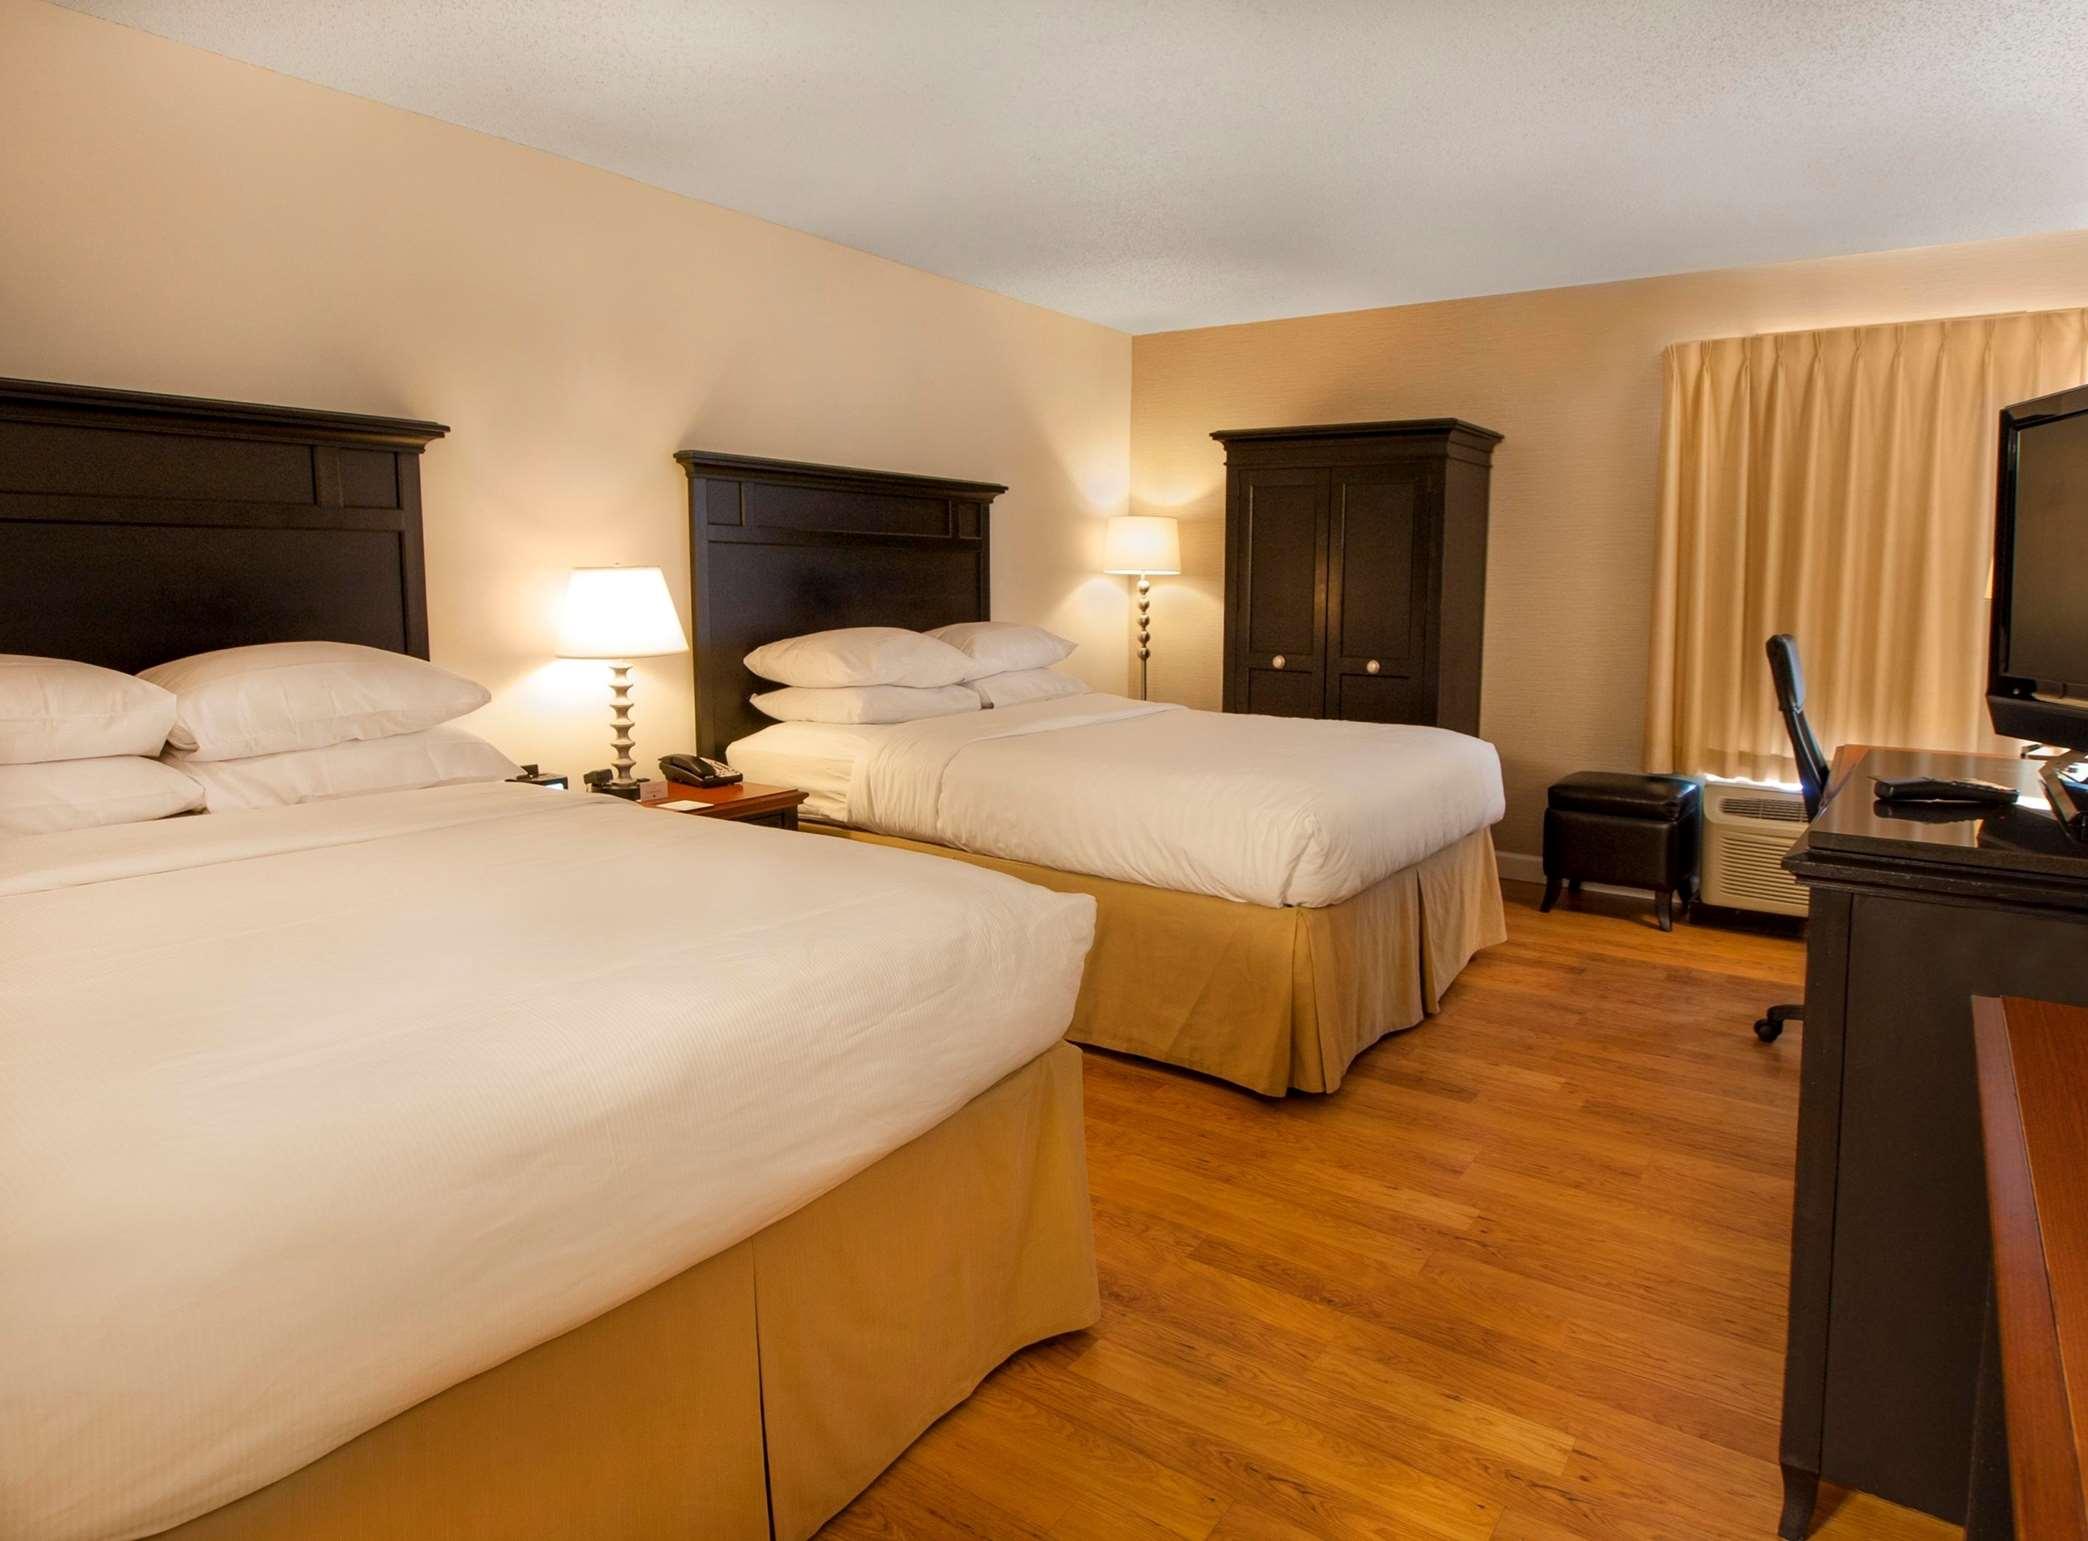 DoubleTree by Hilton Hotel Buffalo - Amherst image 18